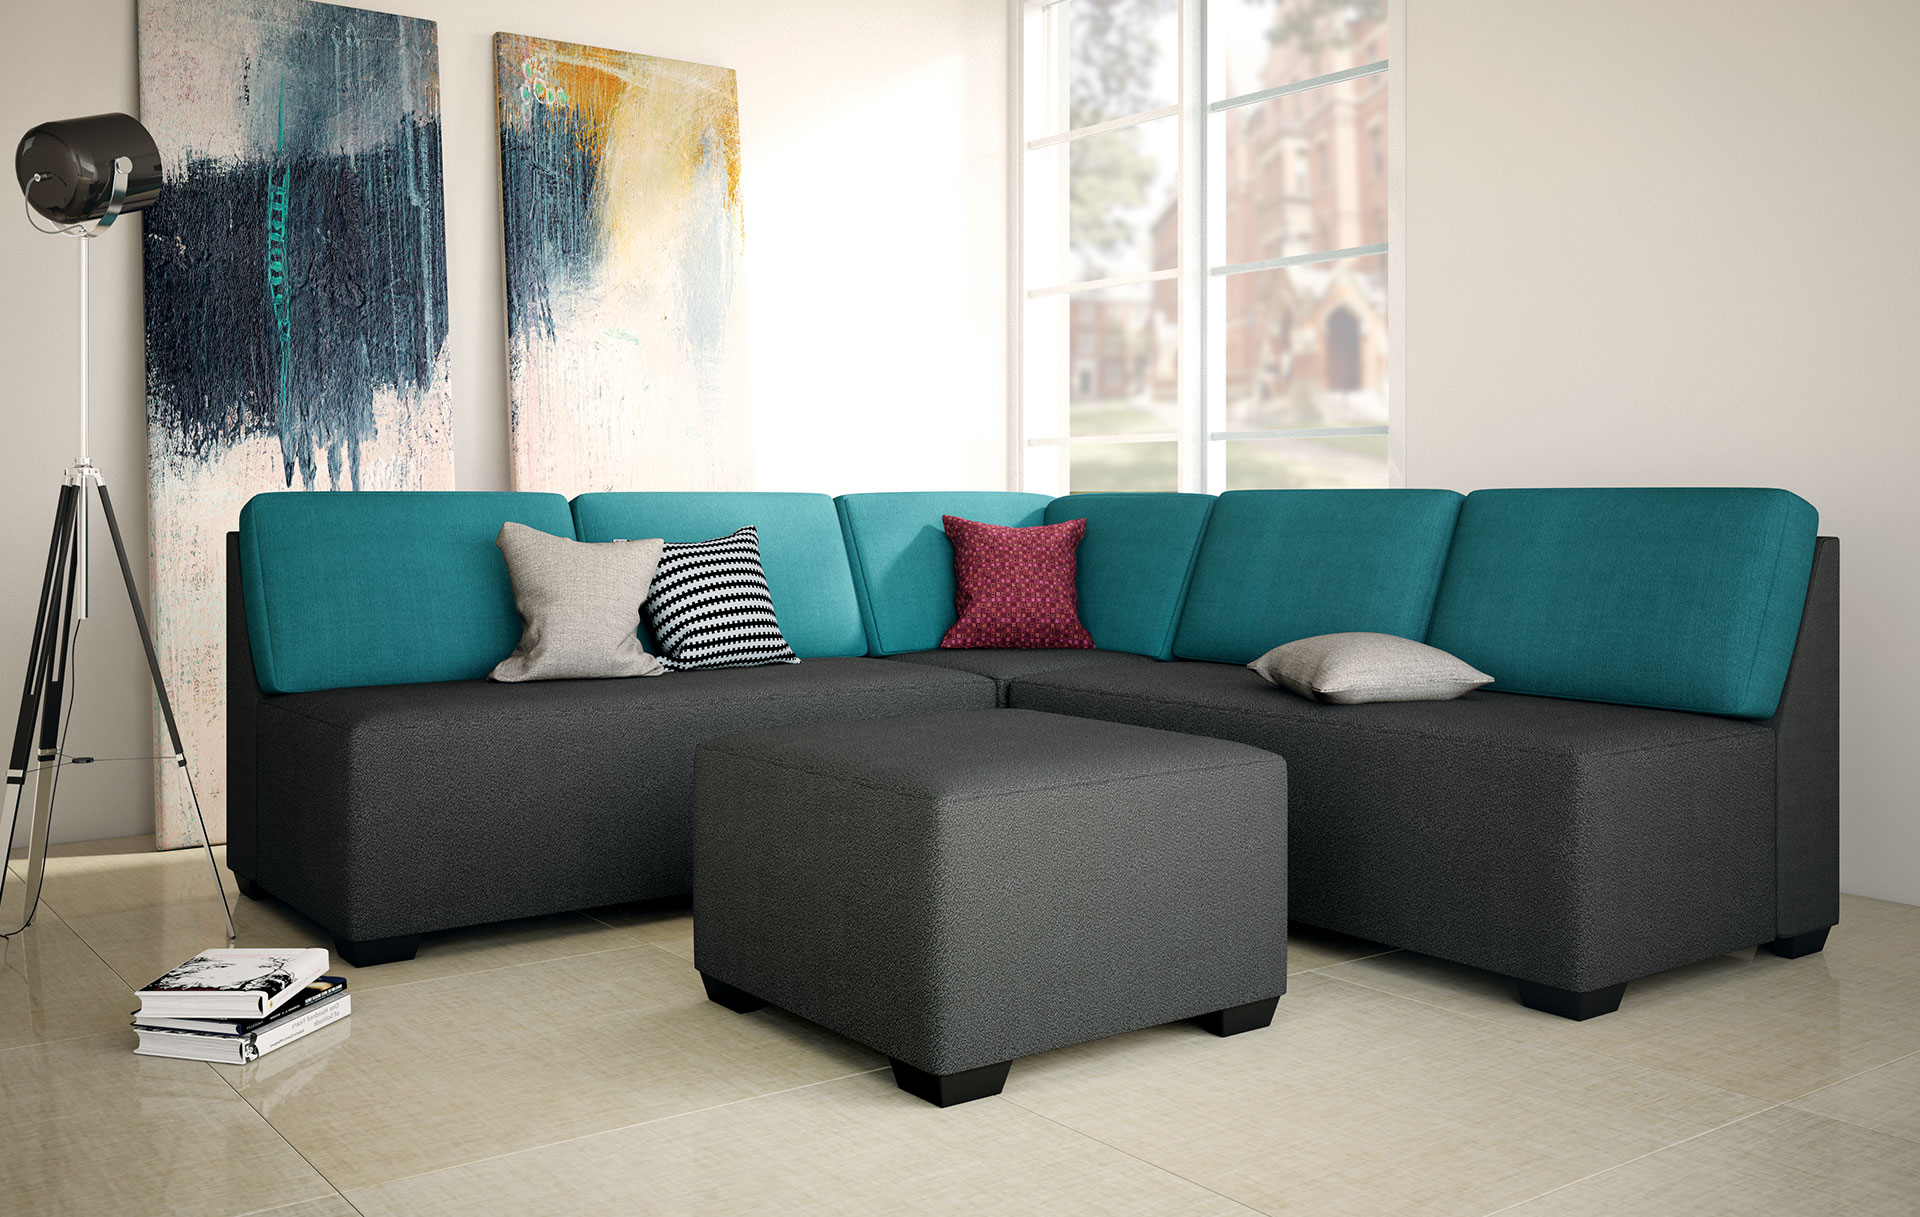 Laguna soft seating collection